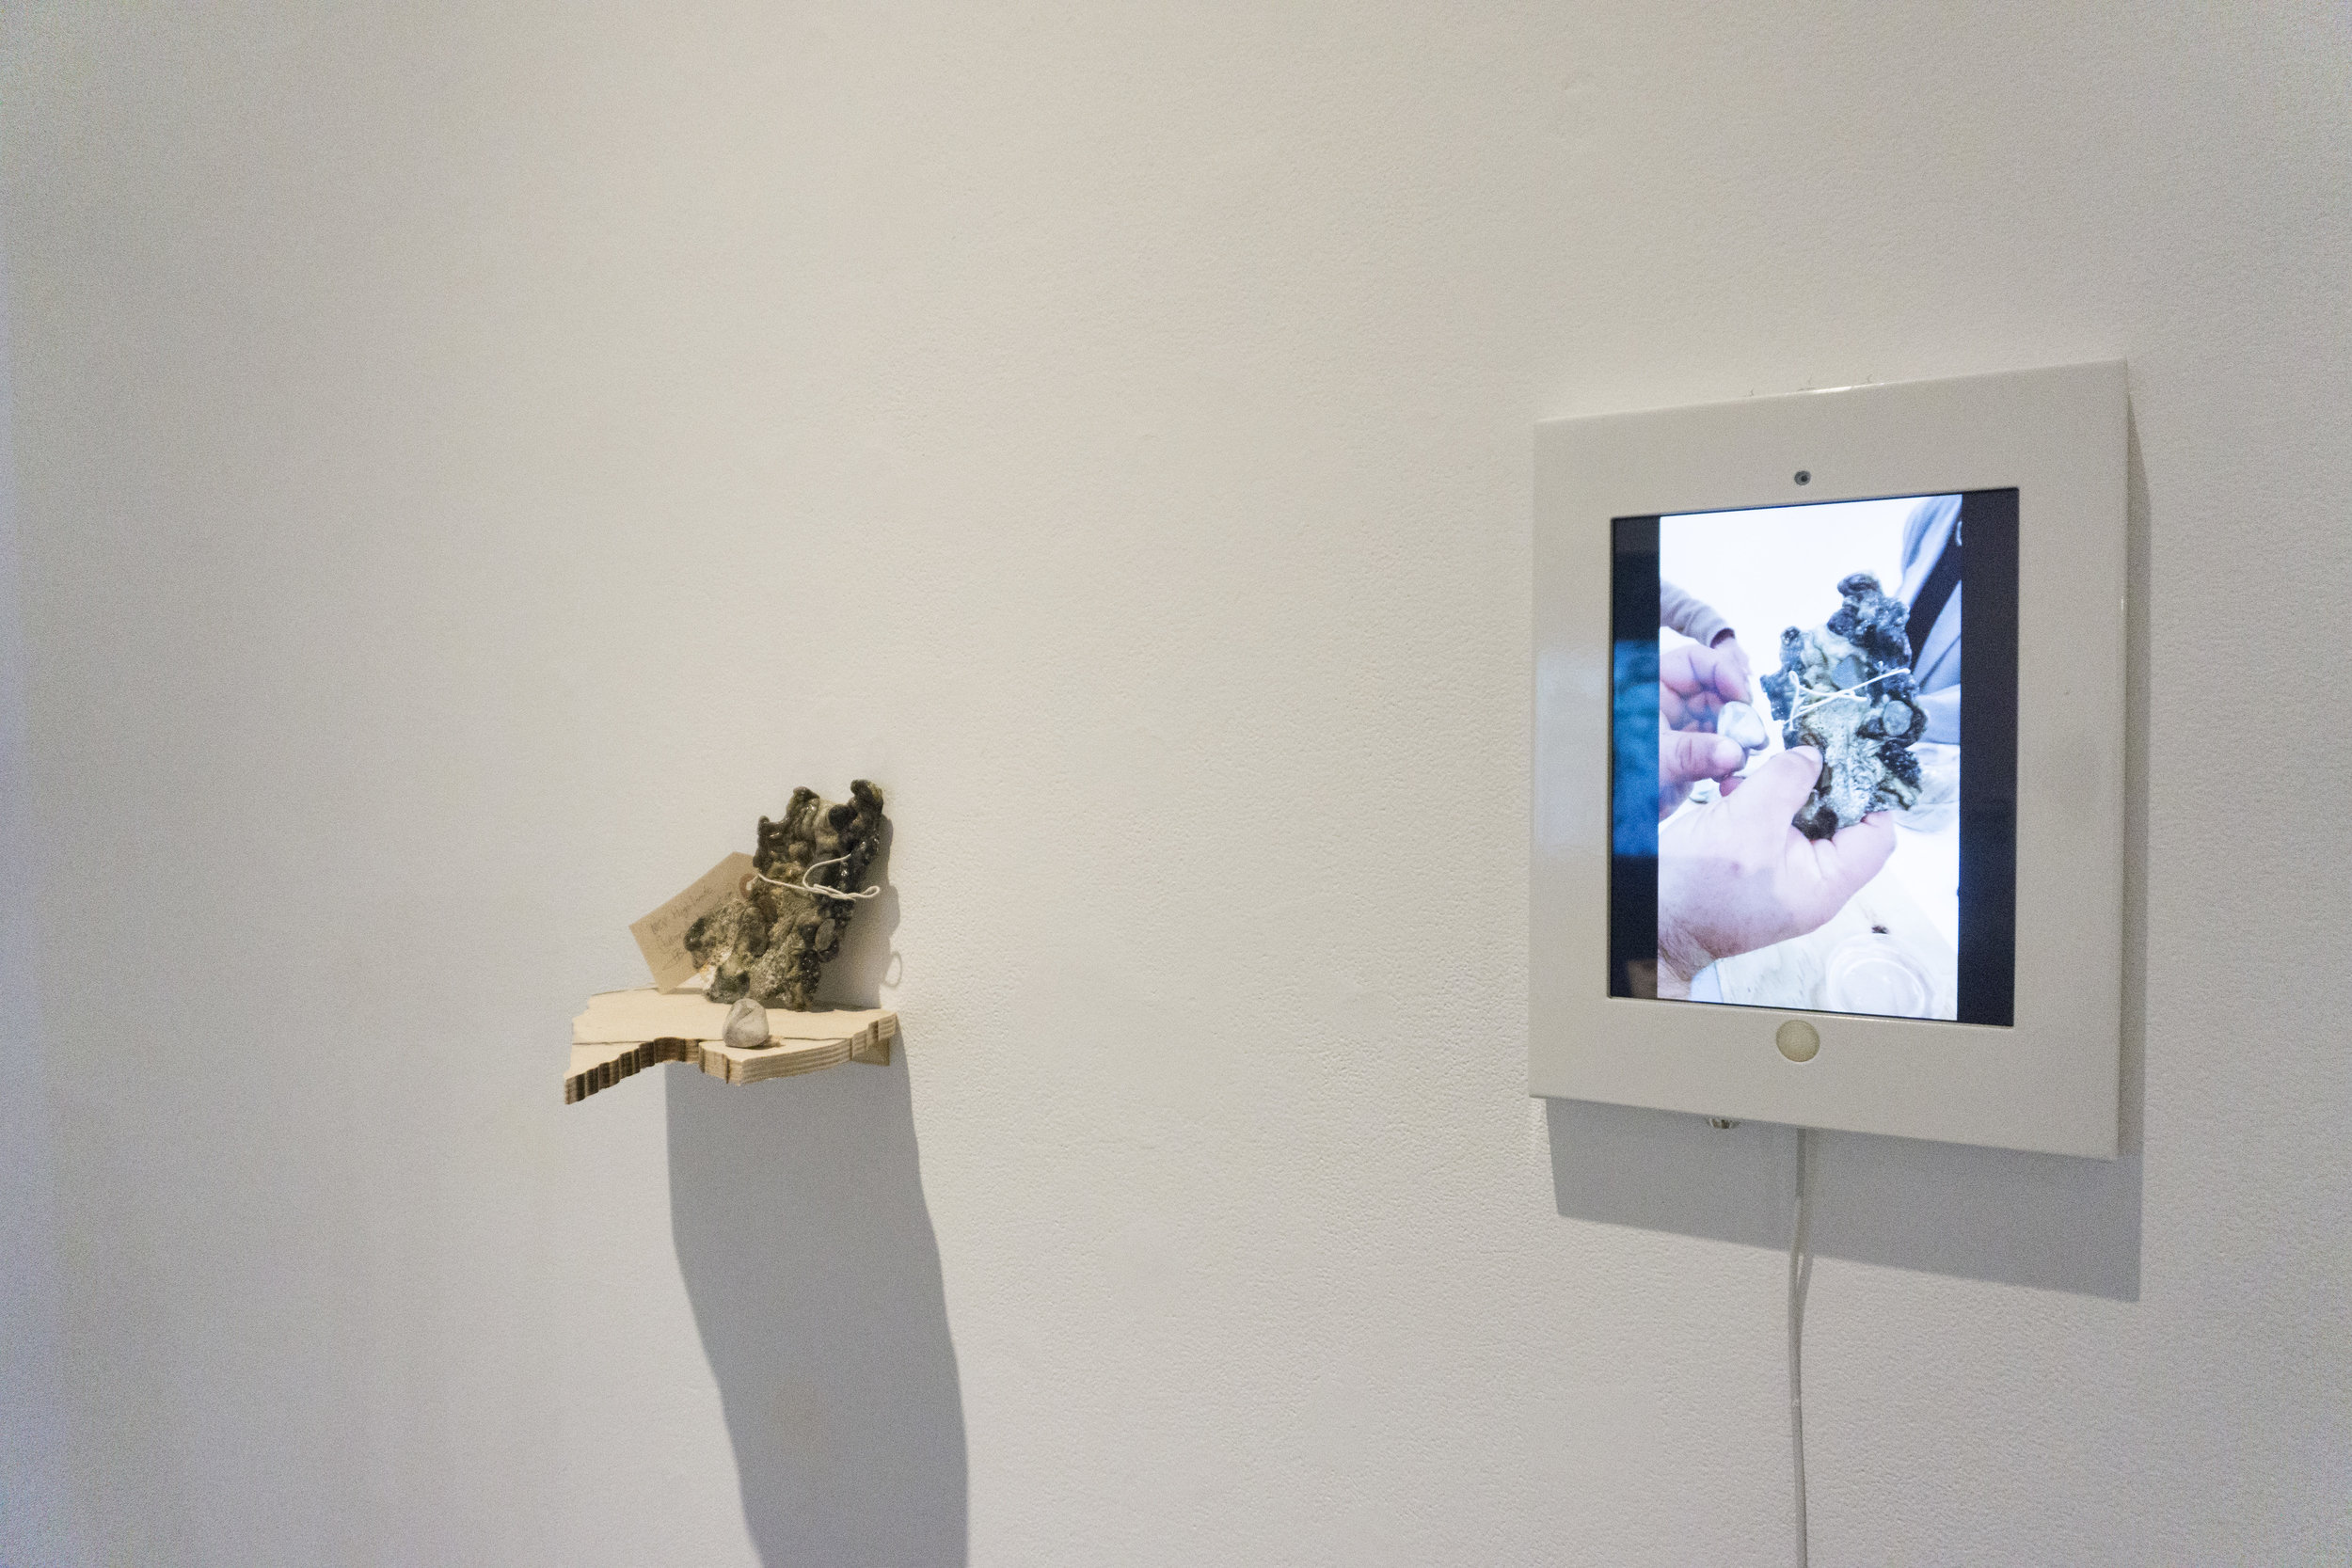 works by Noémie Fortin, Ira Kazi, Michelle Johnson, Lana Tran